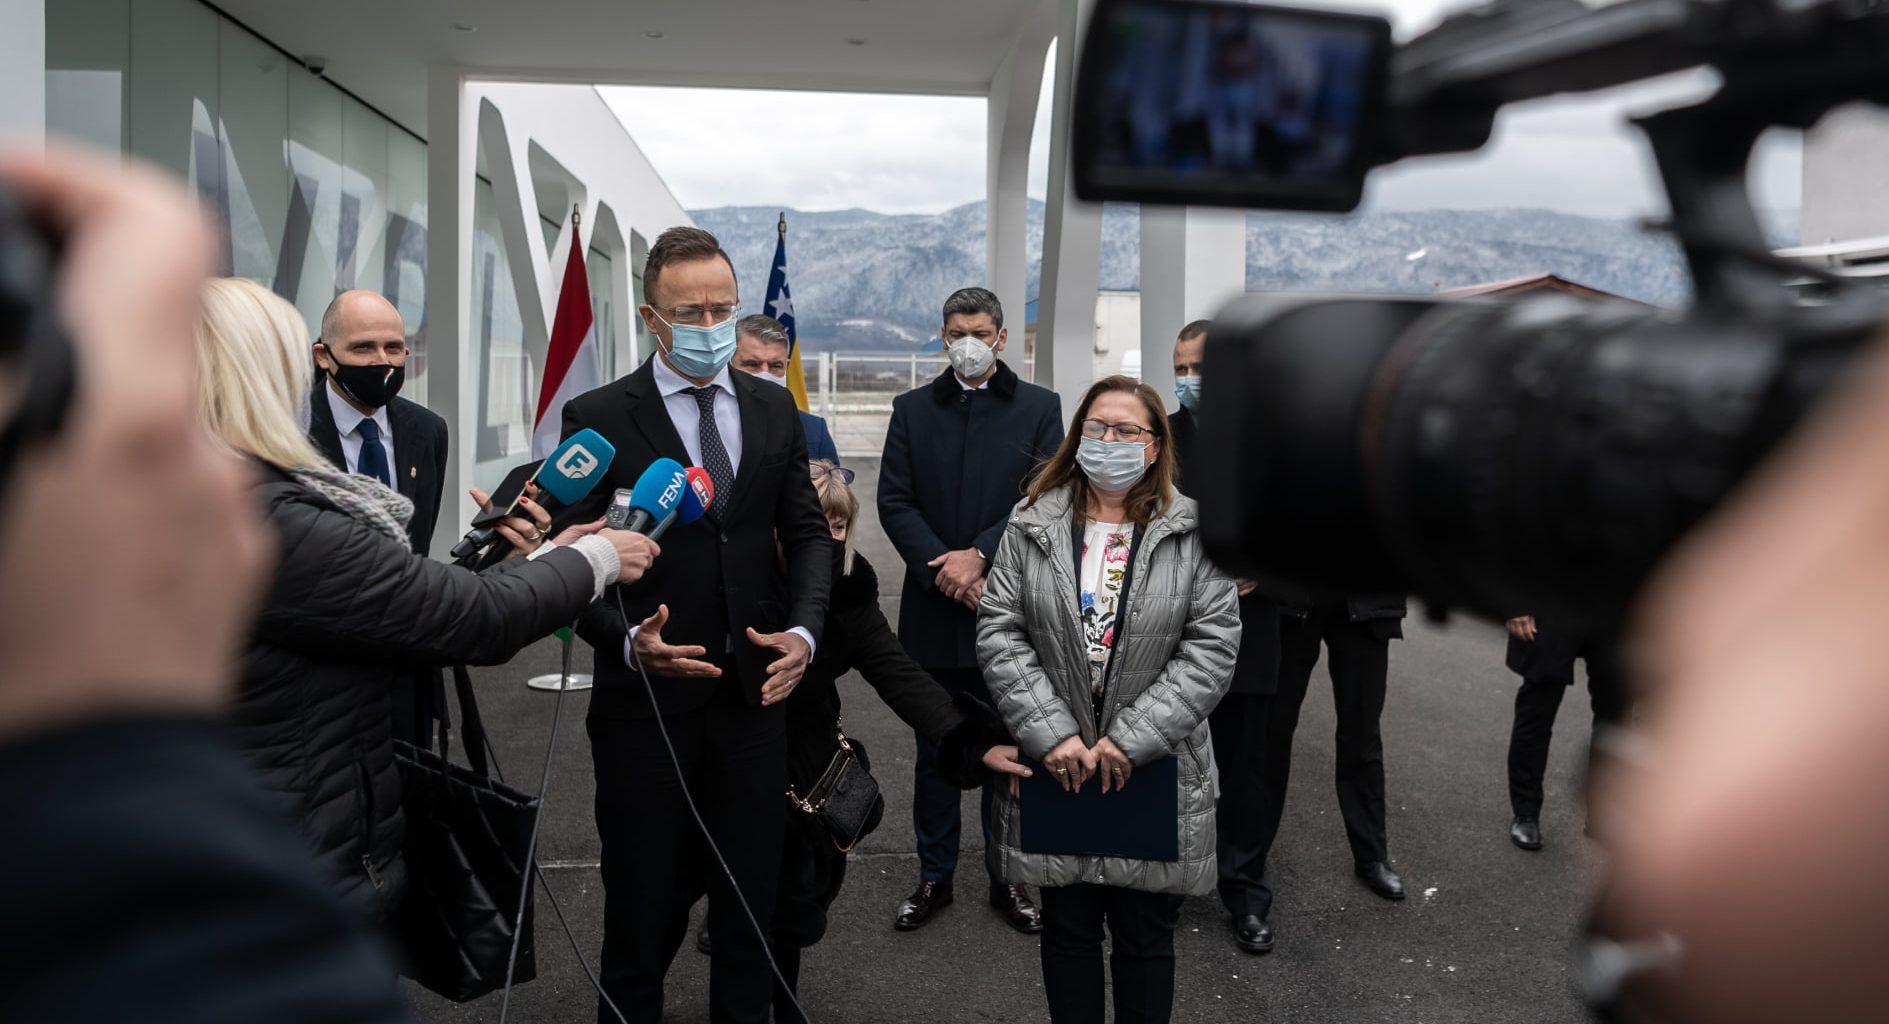 sarajevo hungary bosnia minister